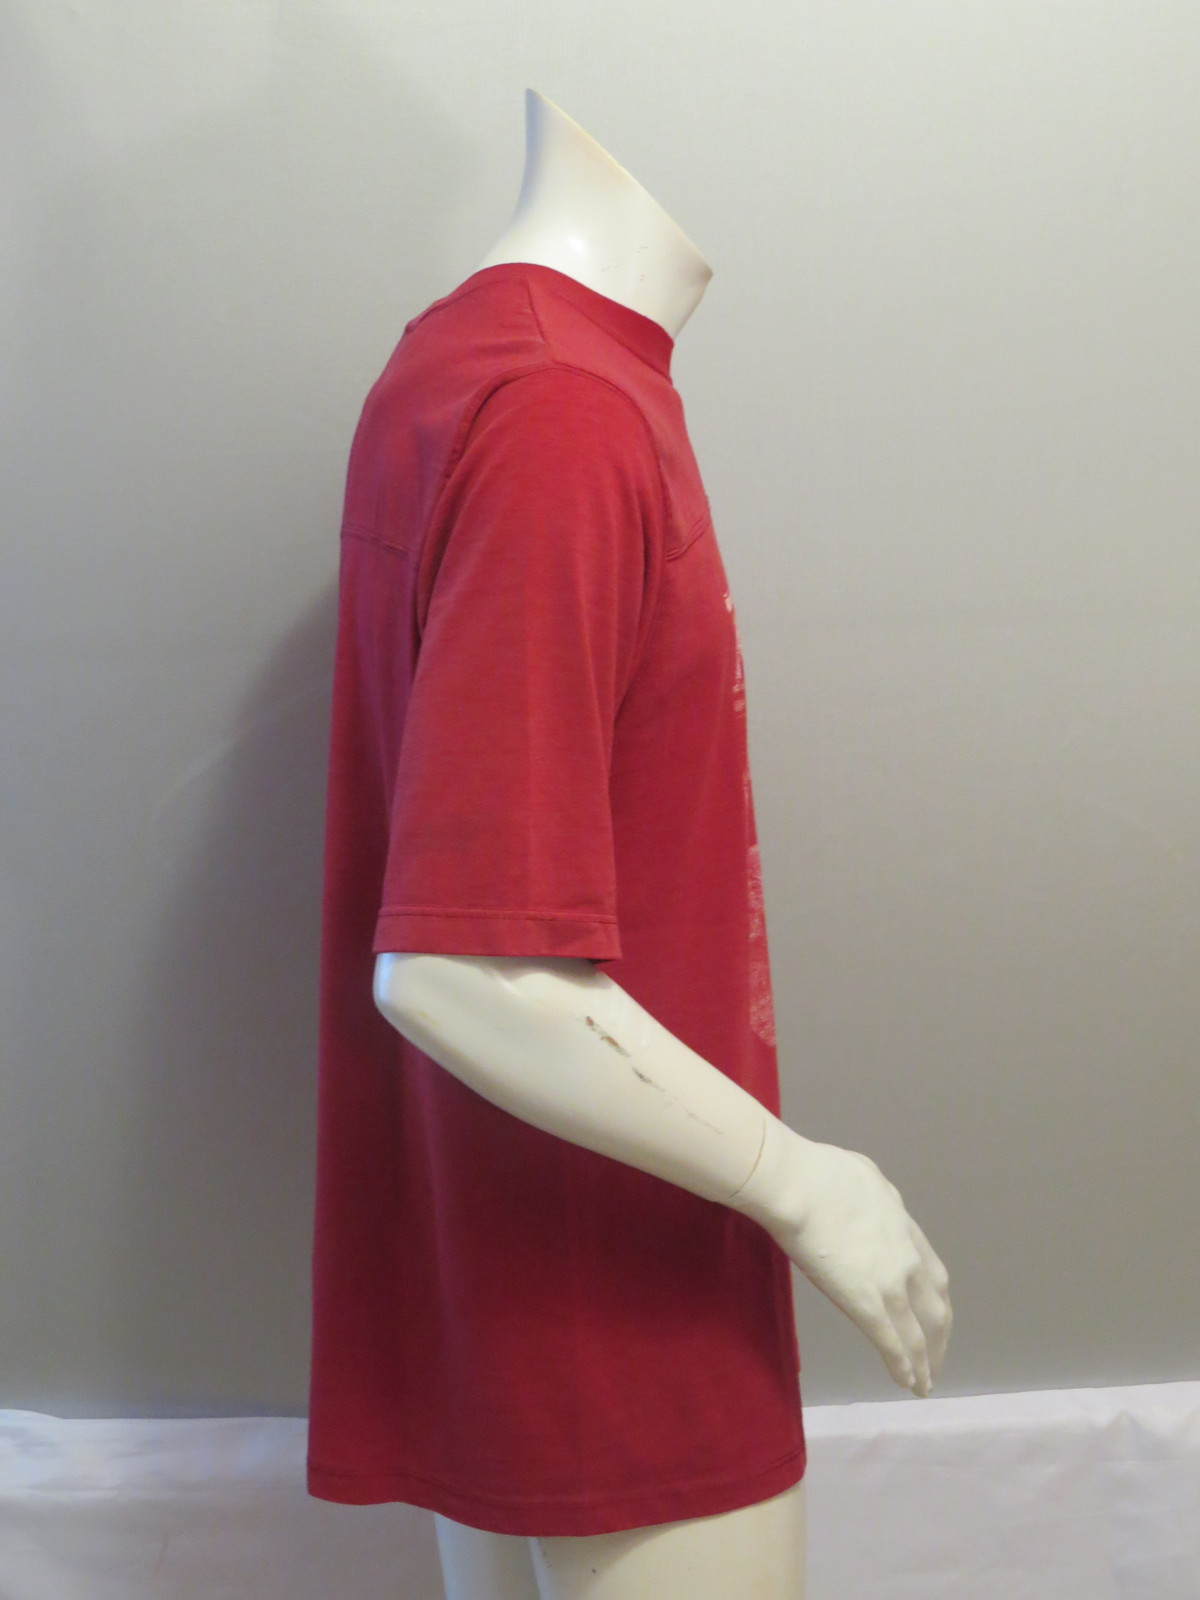 Vintage McMaster Marauders Shirt - Marauders 88 - Men's Large